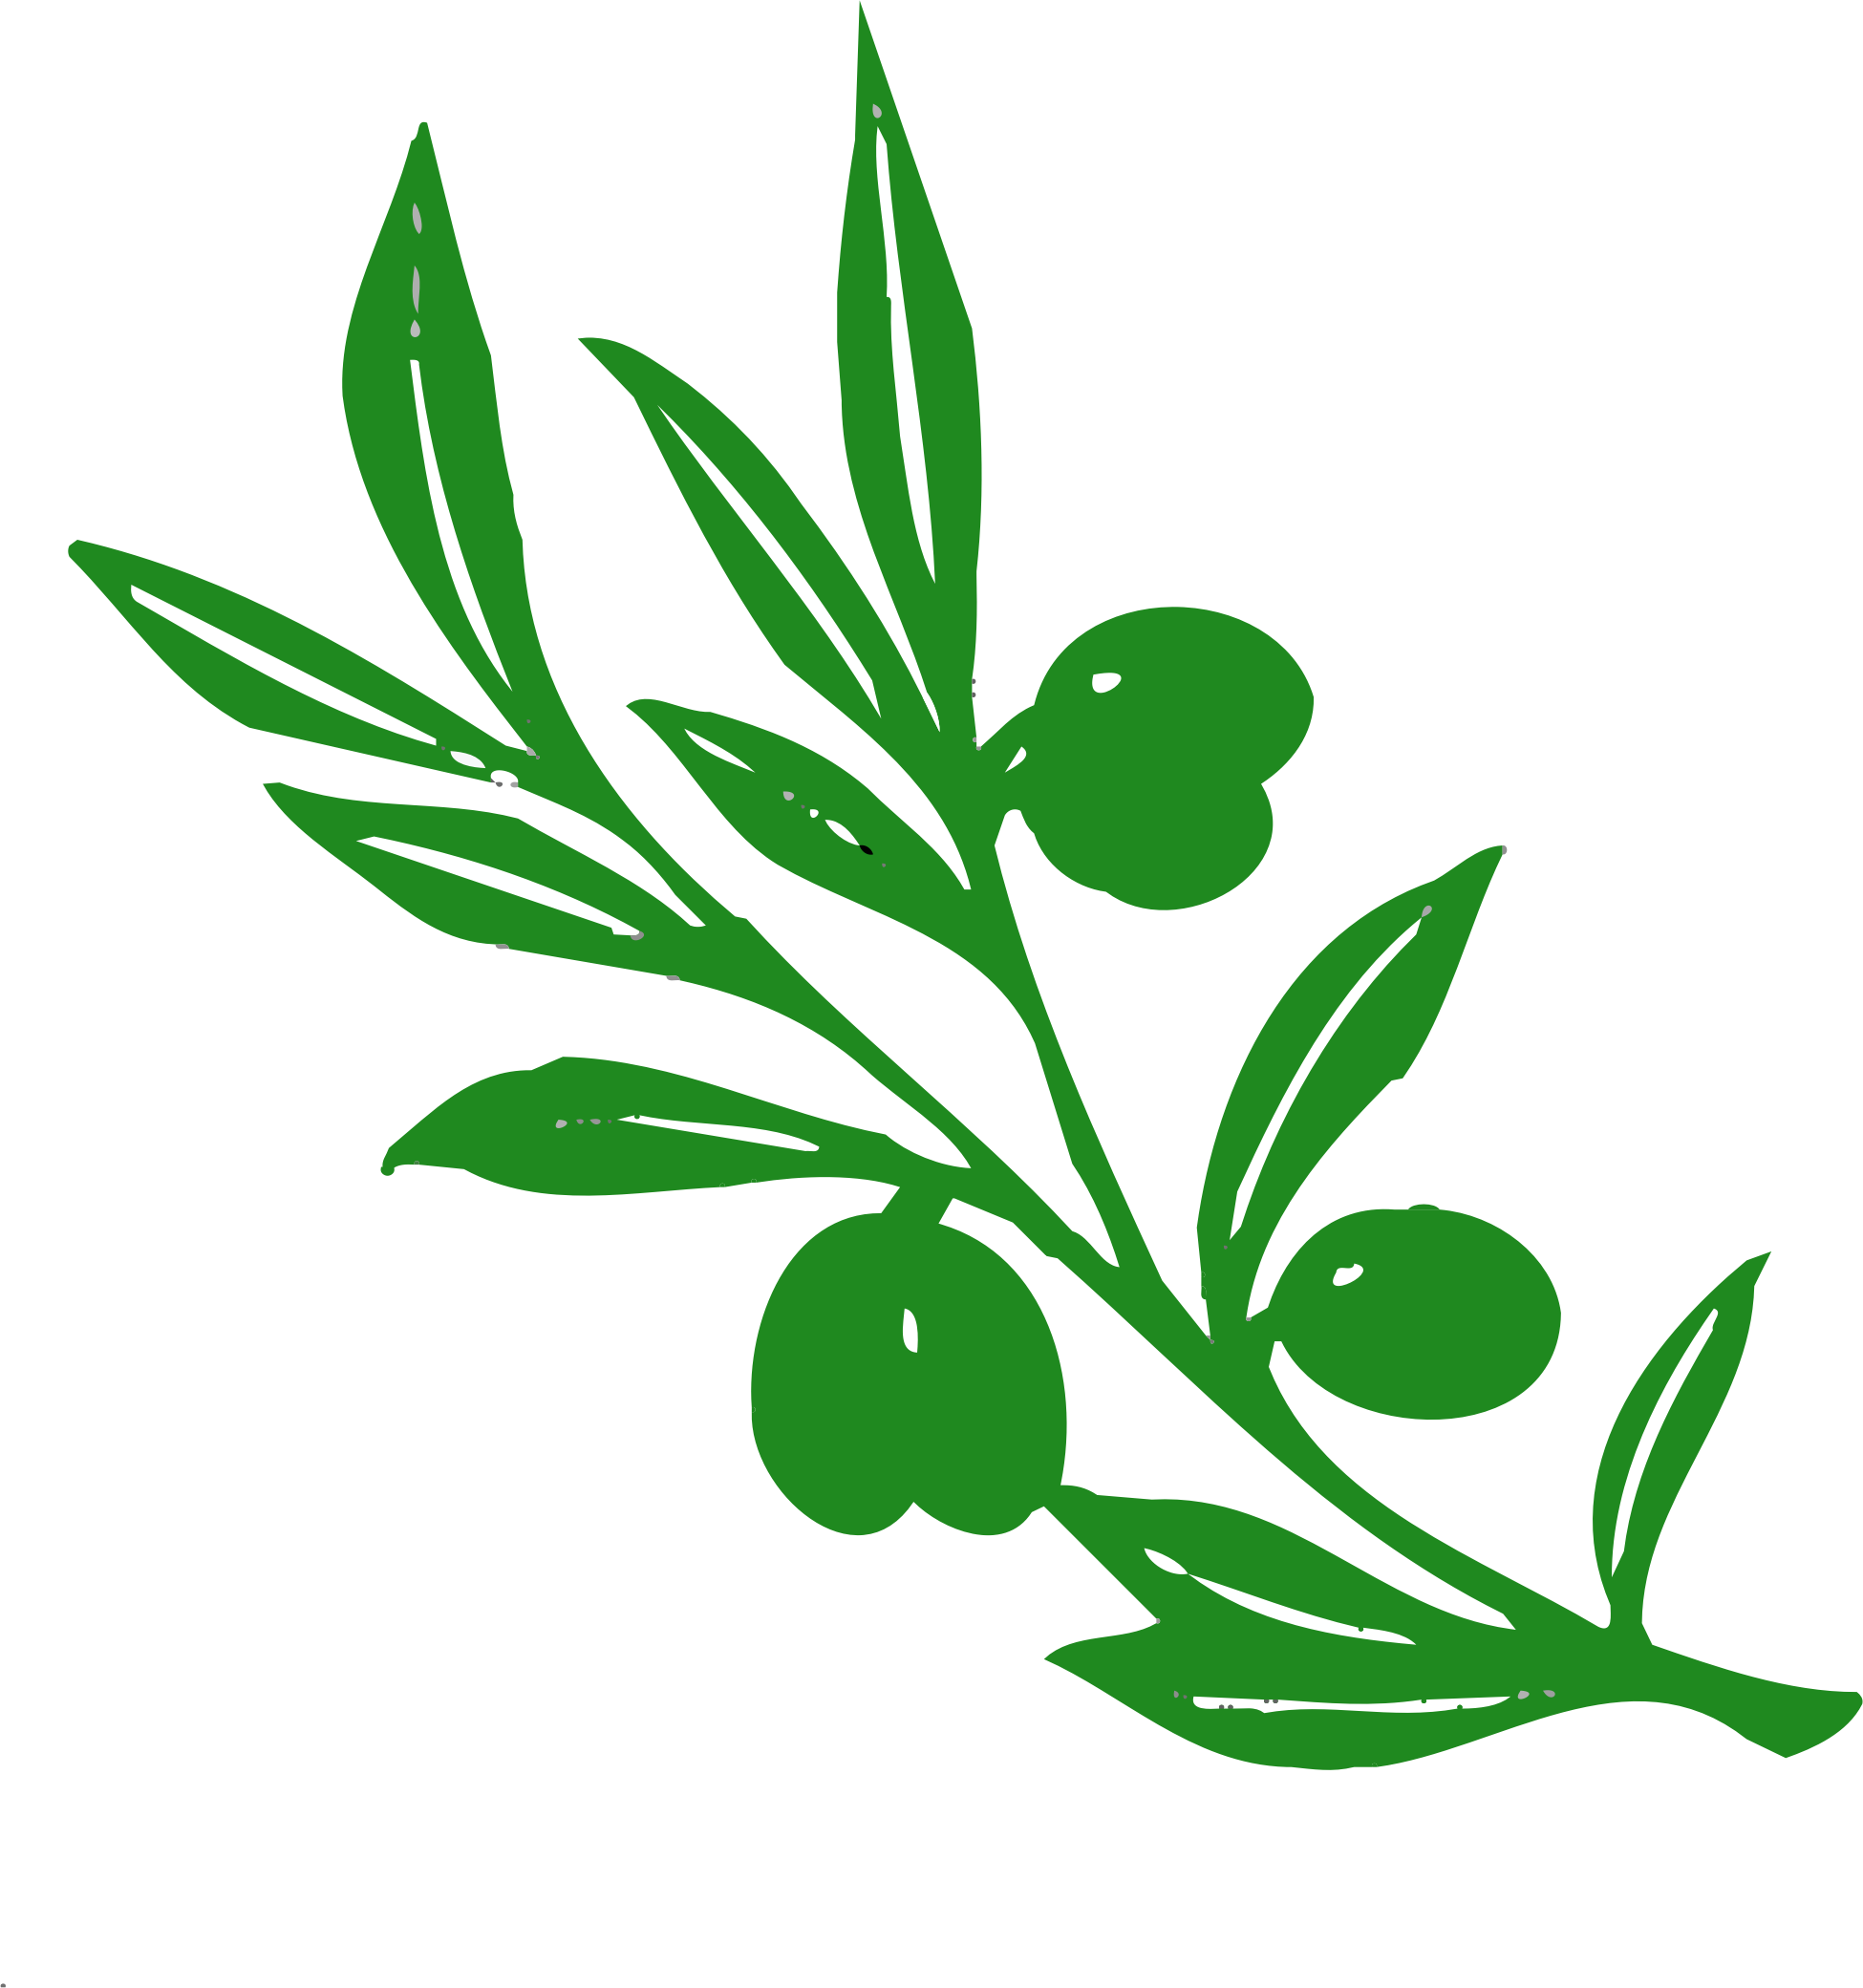 clip art transparent Olive clipart. Tree branch big image